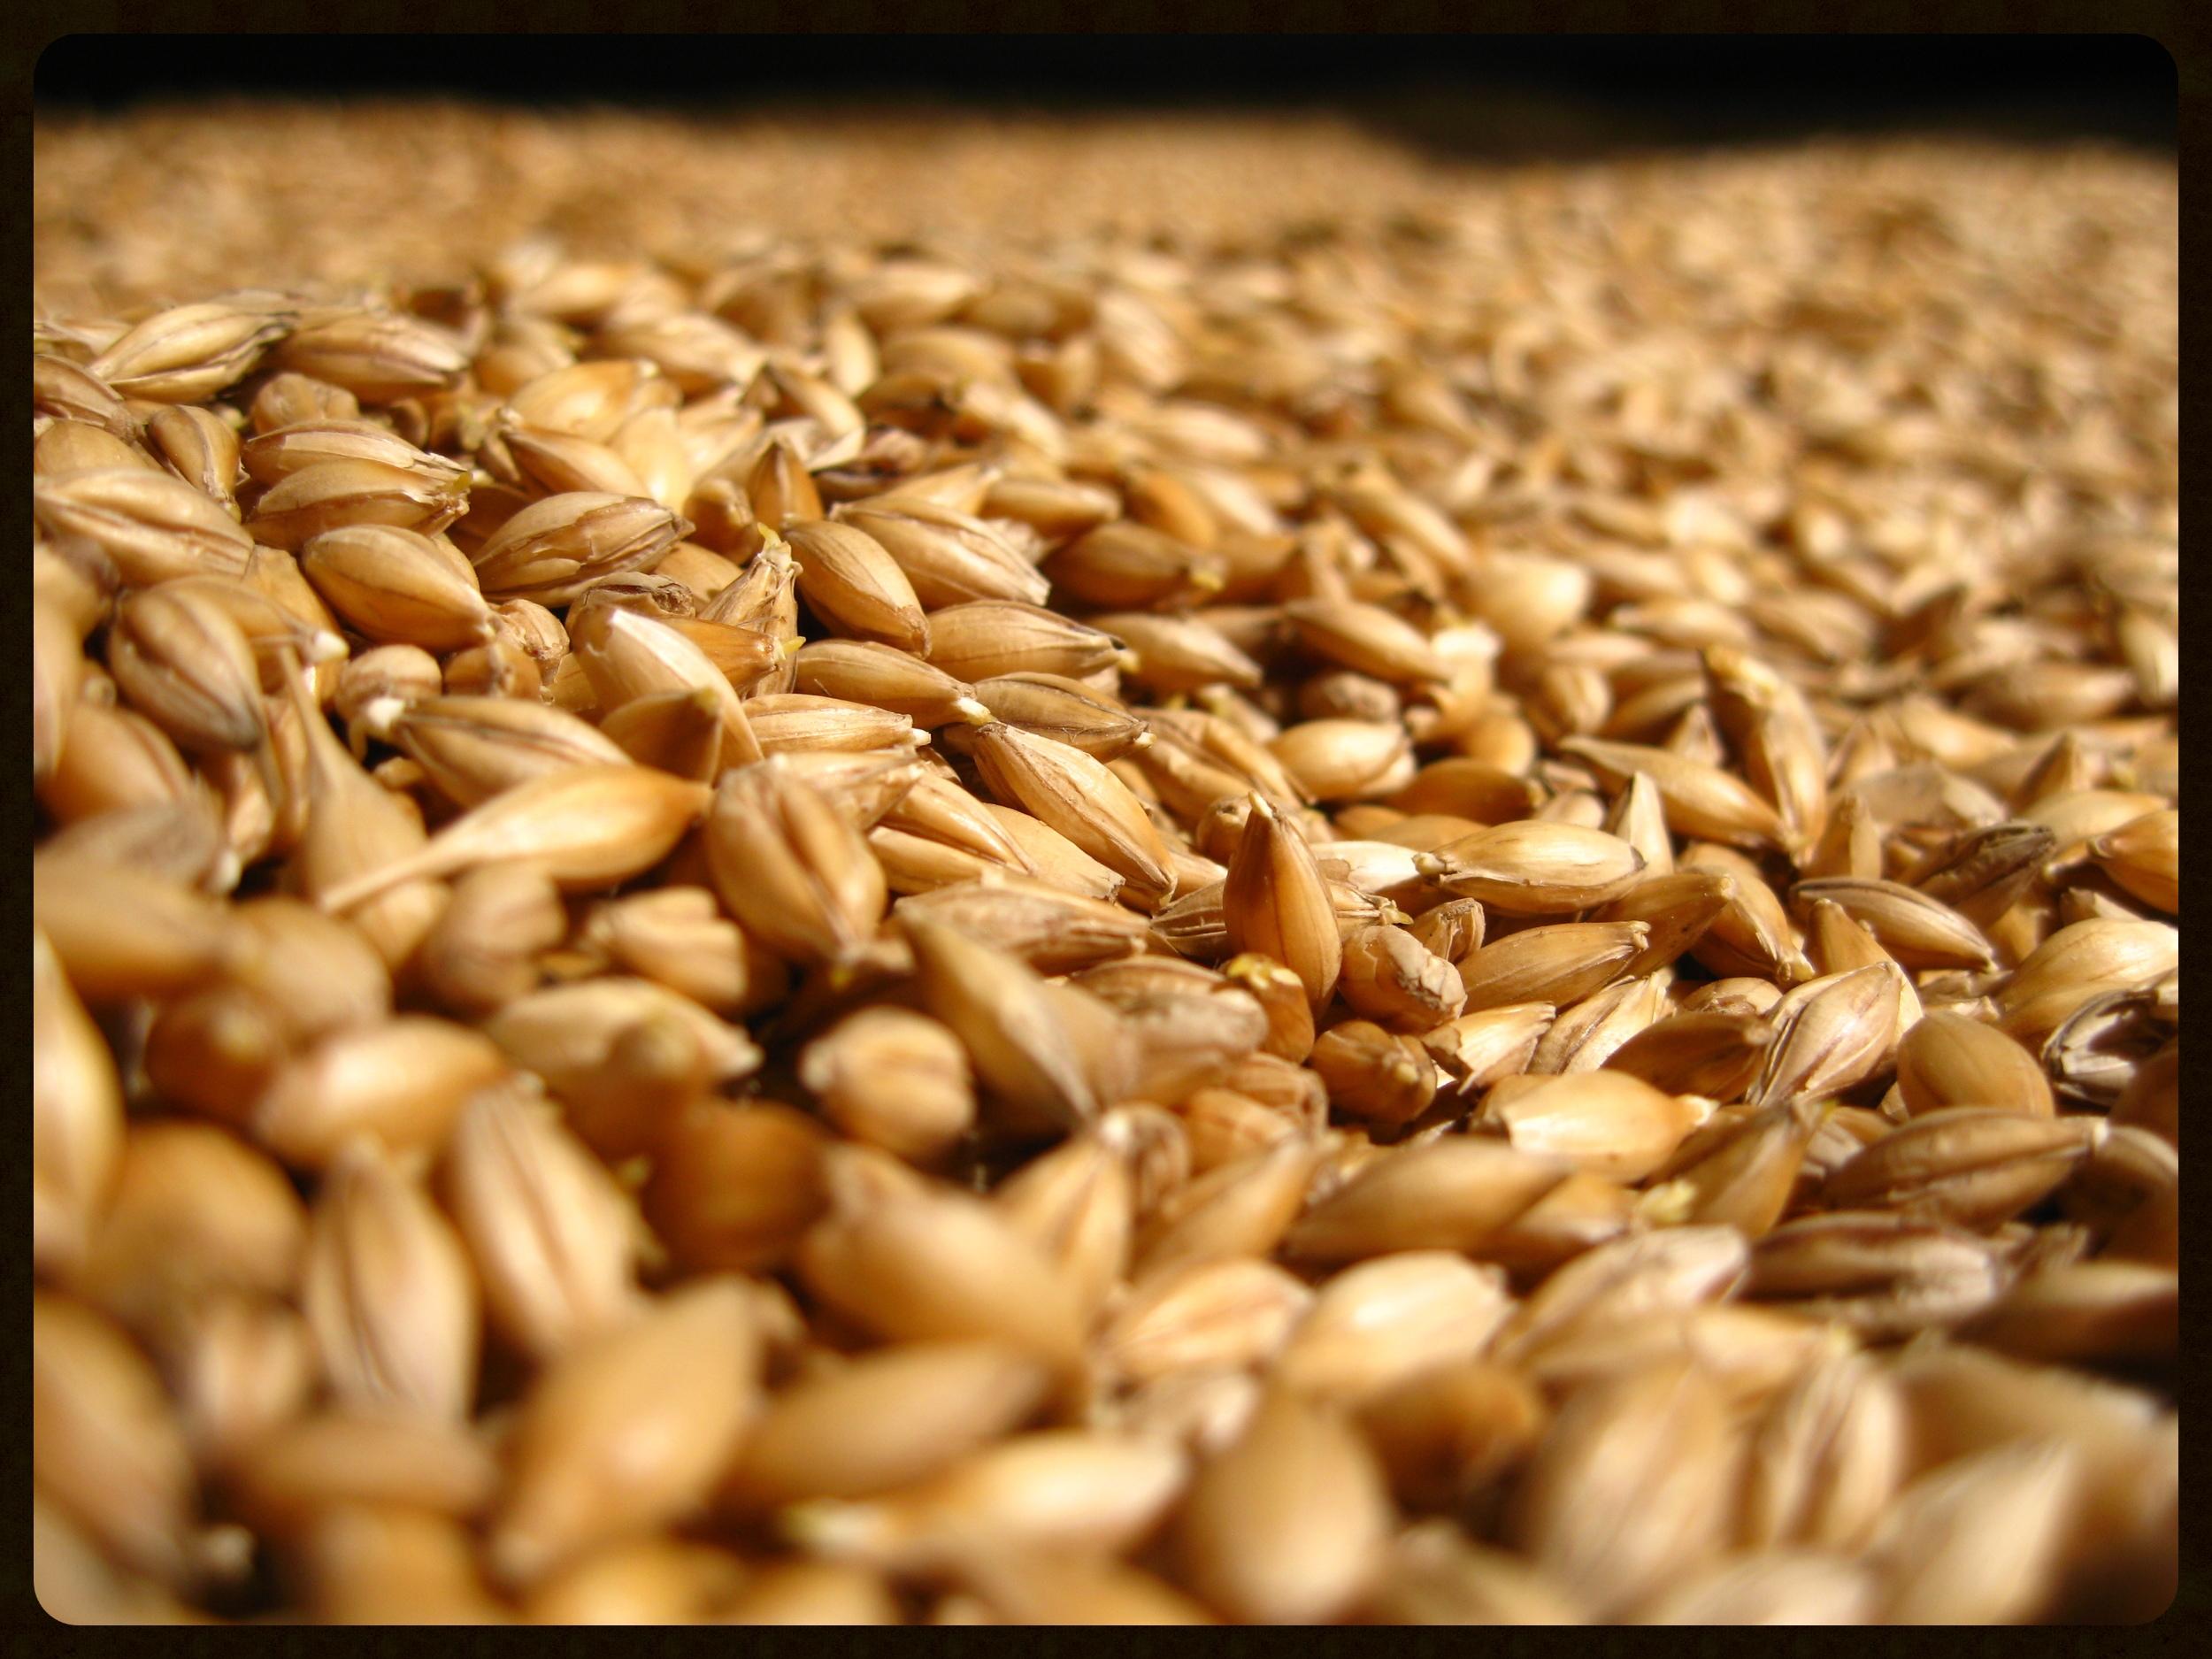 Floor malting barley at Bowmore, Islay.